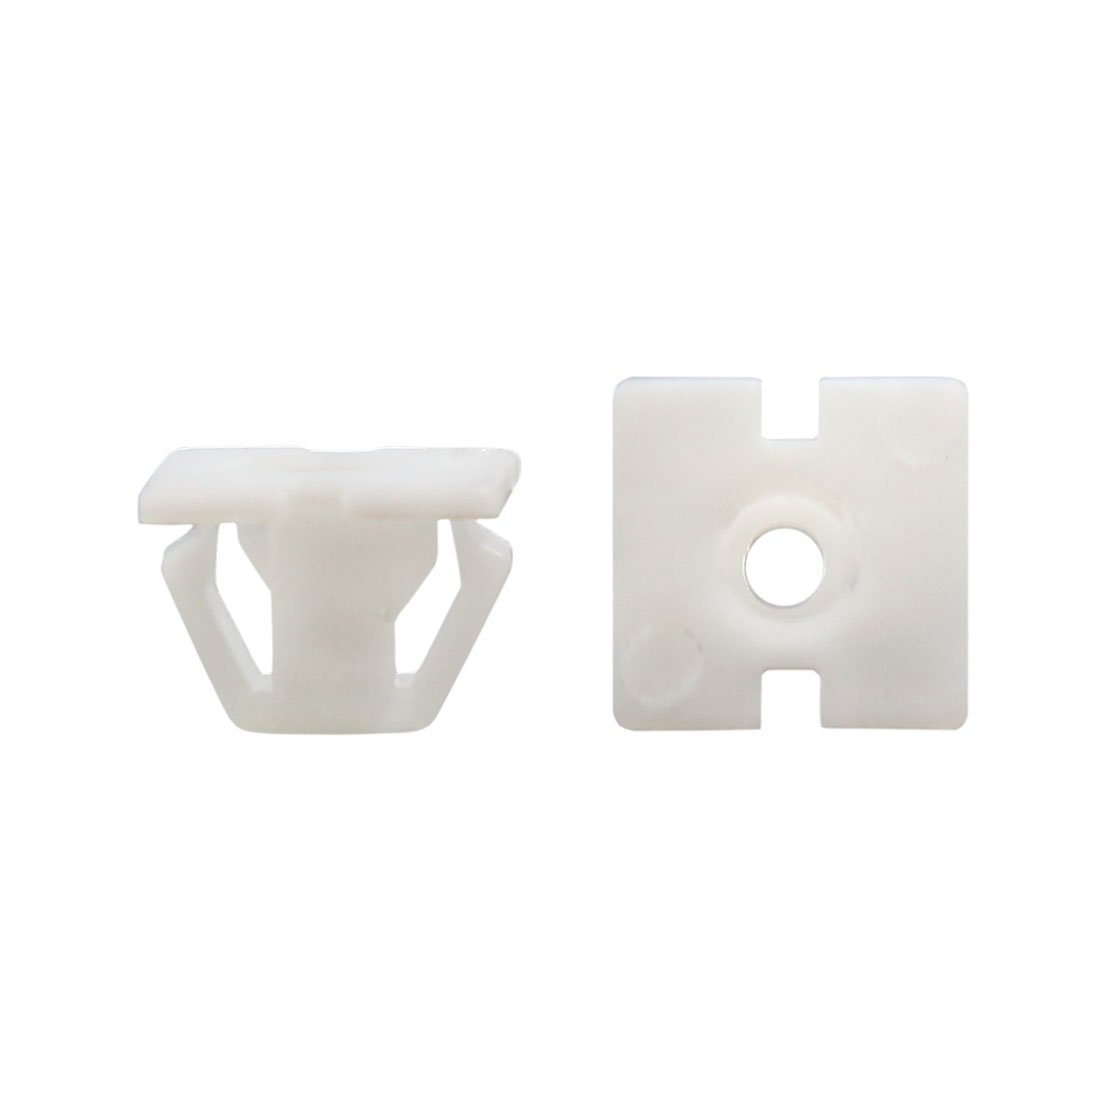 30Pcs Universal Plastic Rivet Fastener Mud Flaps Bumper Fender Clips White 13mm - image 2 of 2